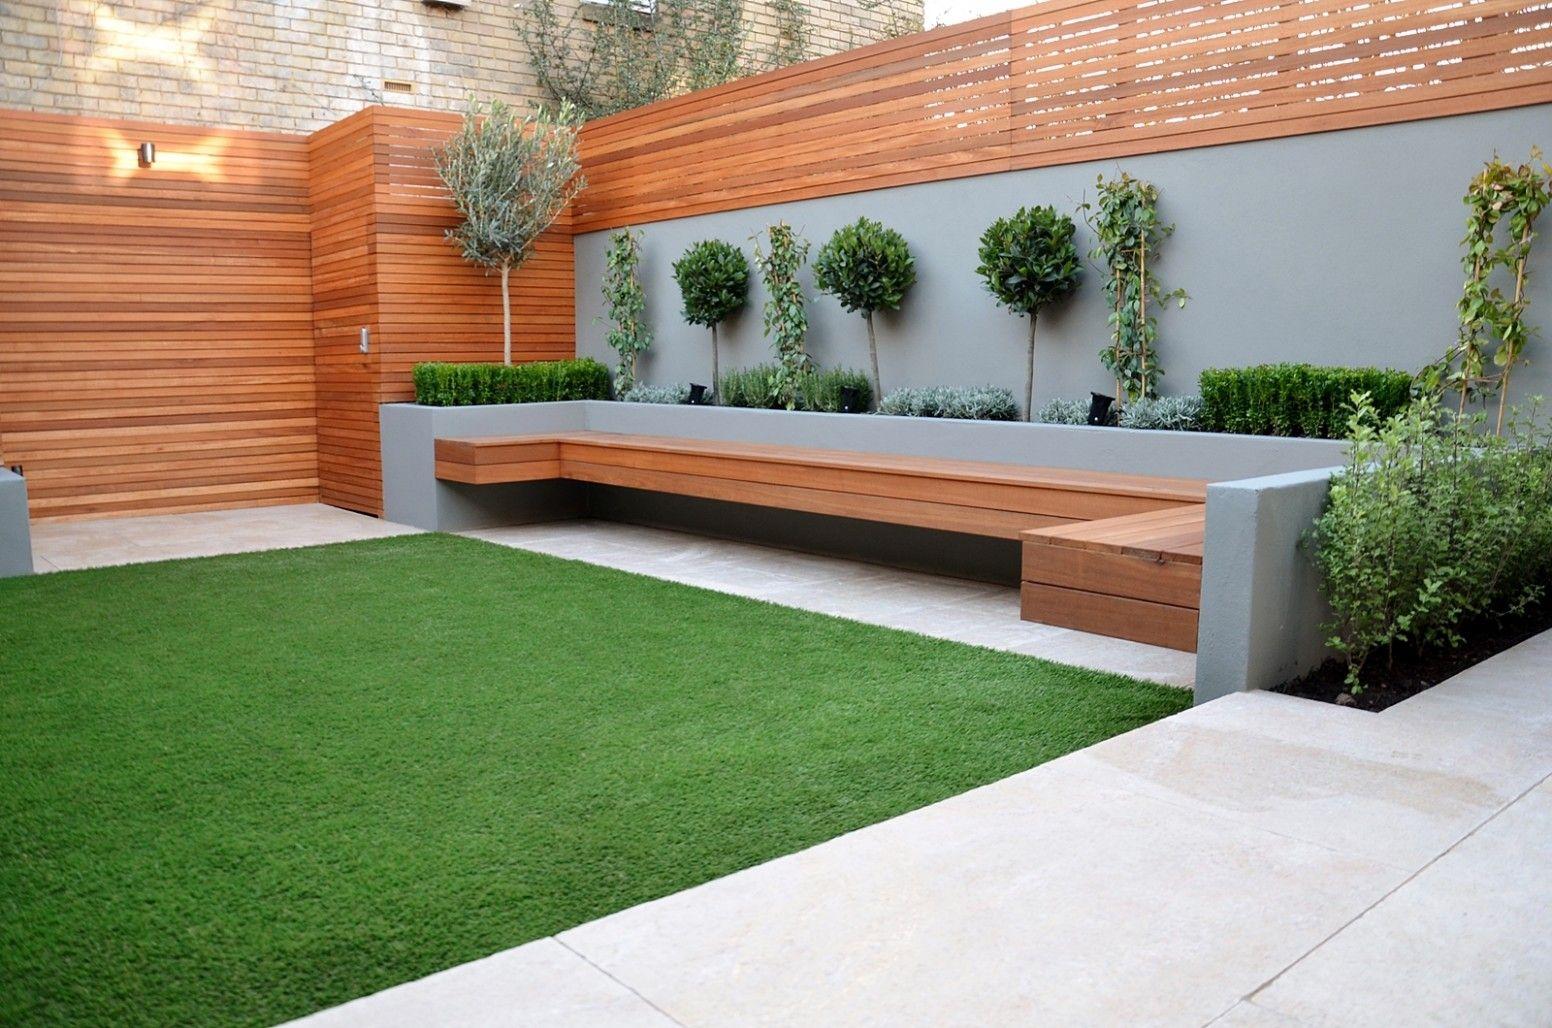 Come Recintare Un Giardino low maintenance garden ideas uk a low aliment garden is